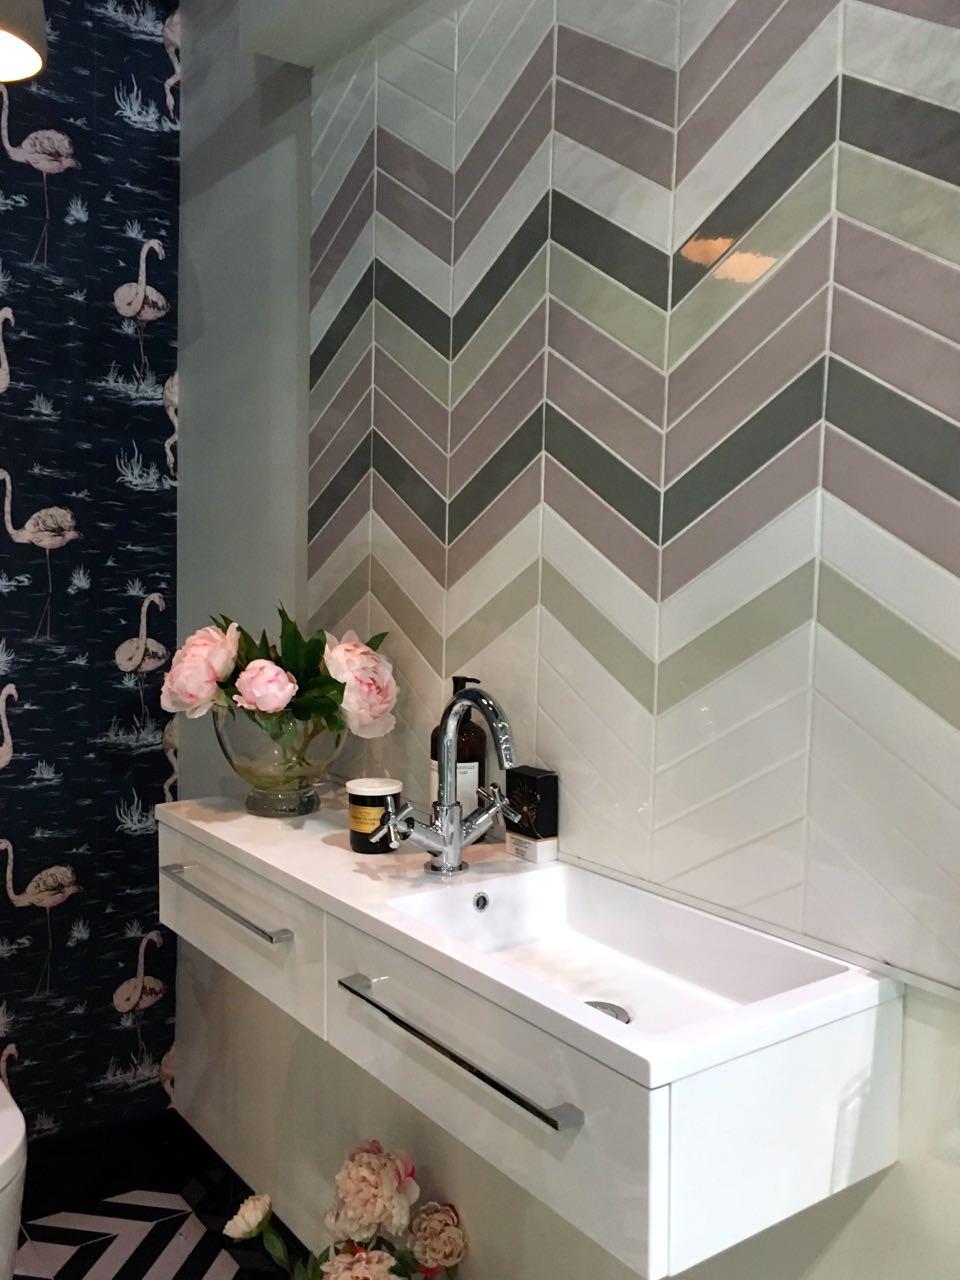 chevron pastel tiles in the grace & grey lavatory project